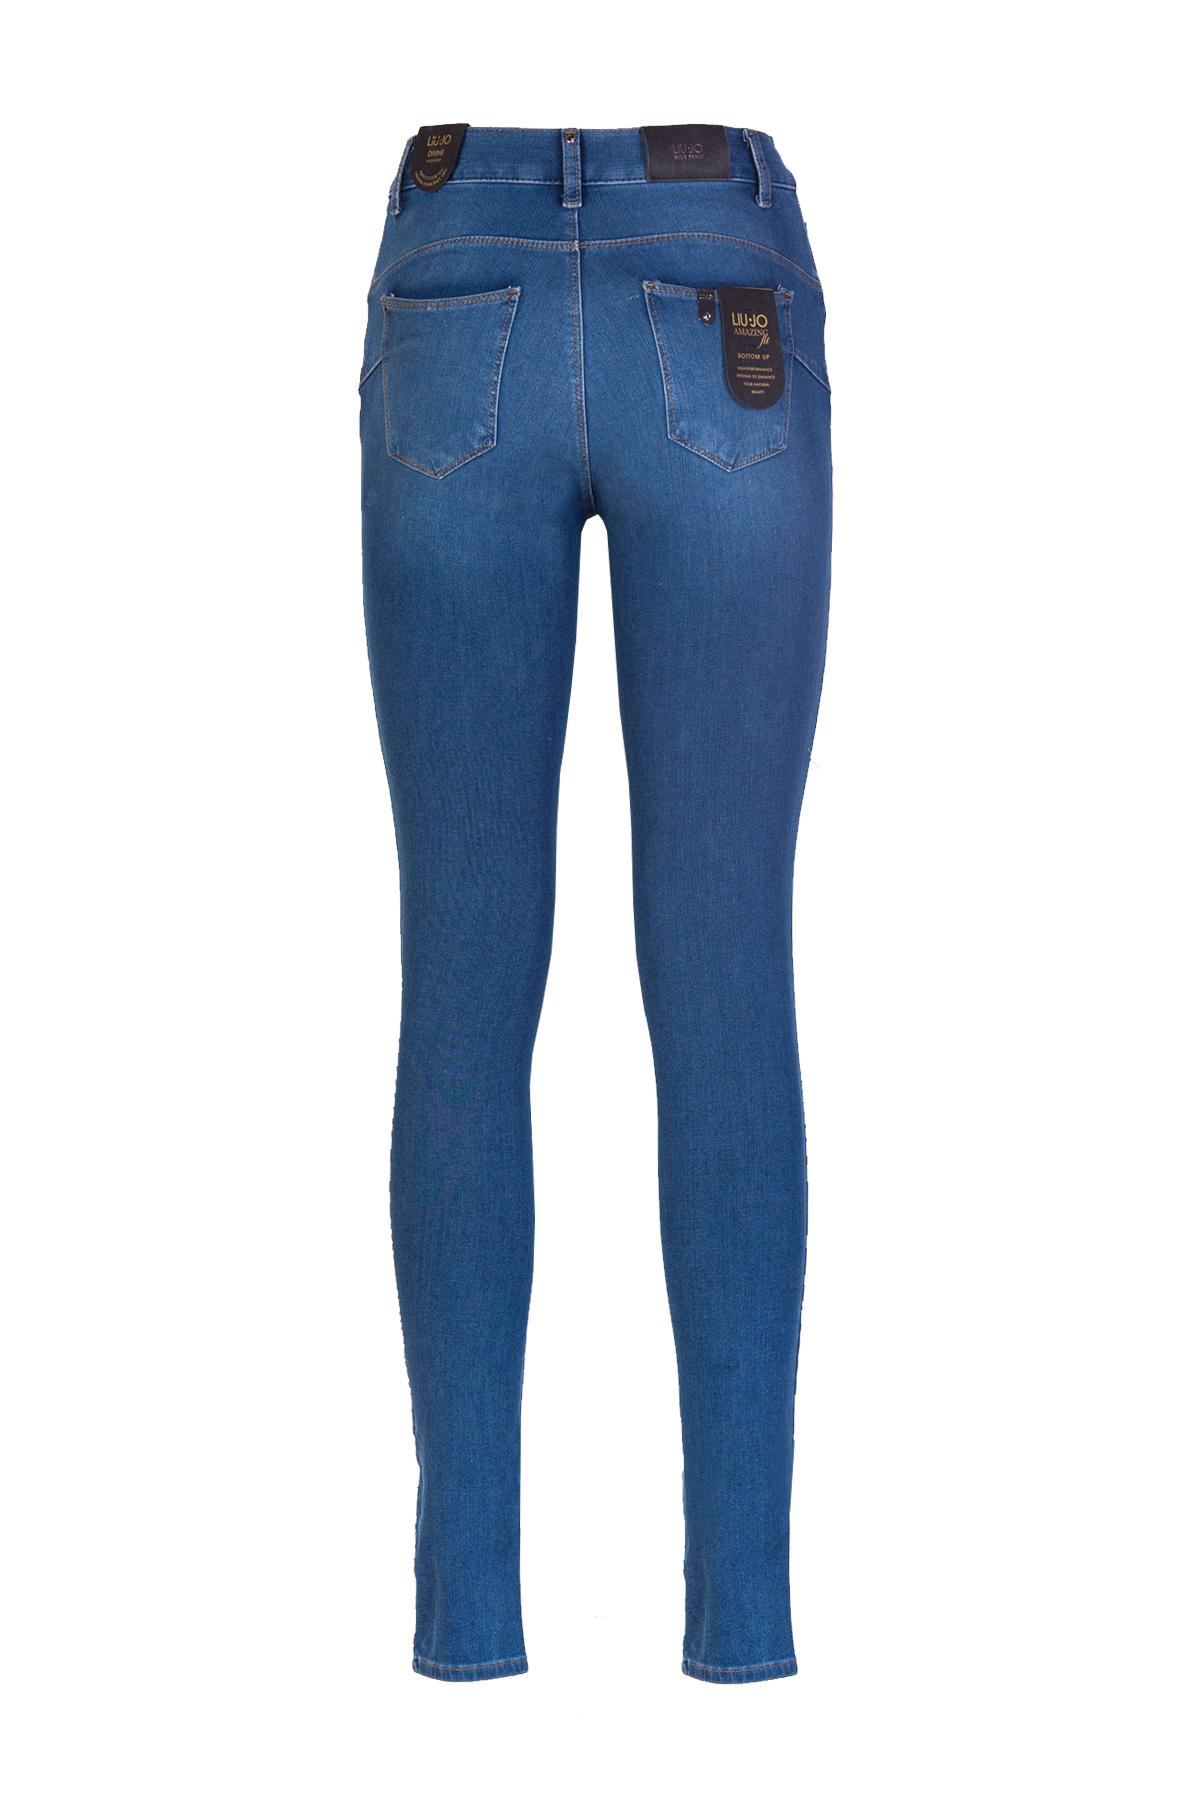 JEANS SKINNY LIU JO BLUE DENIM | Jeans | U18044D419577538DENBLZIPPER